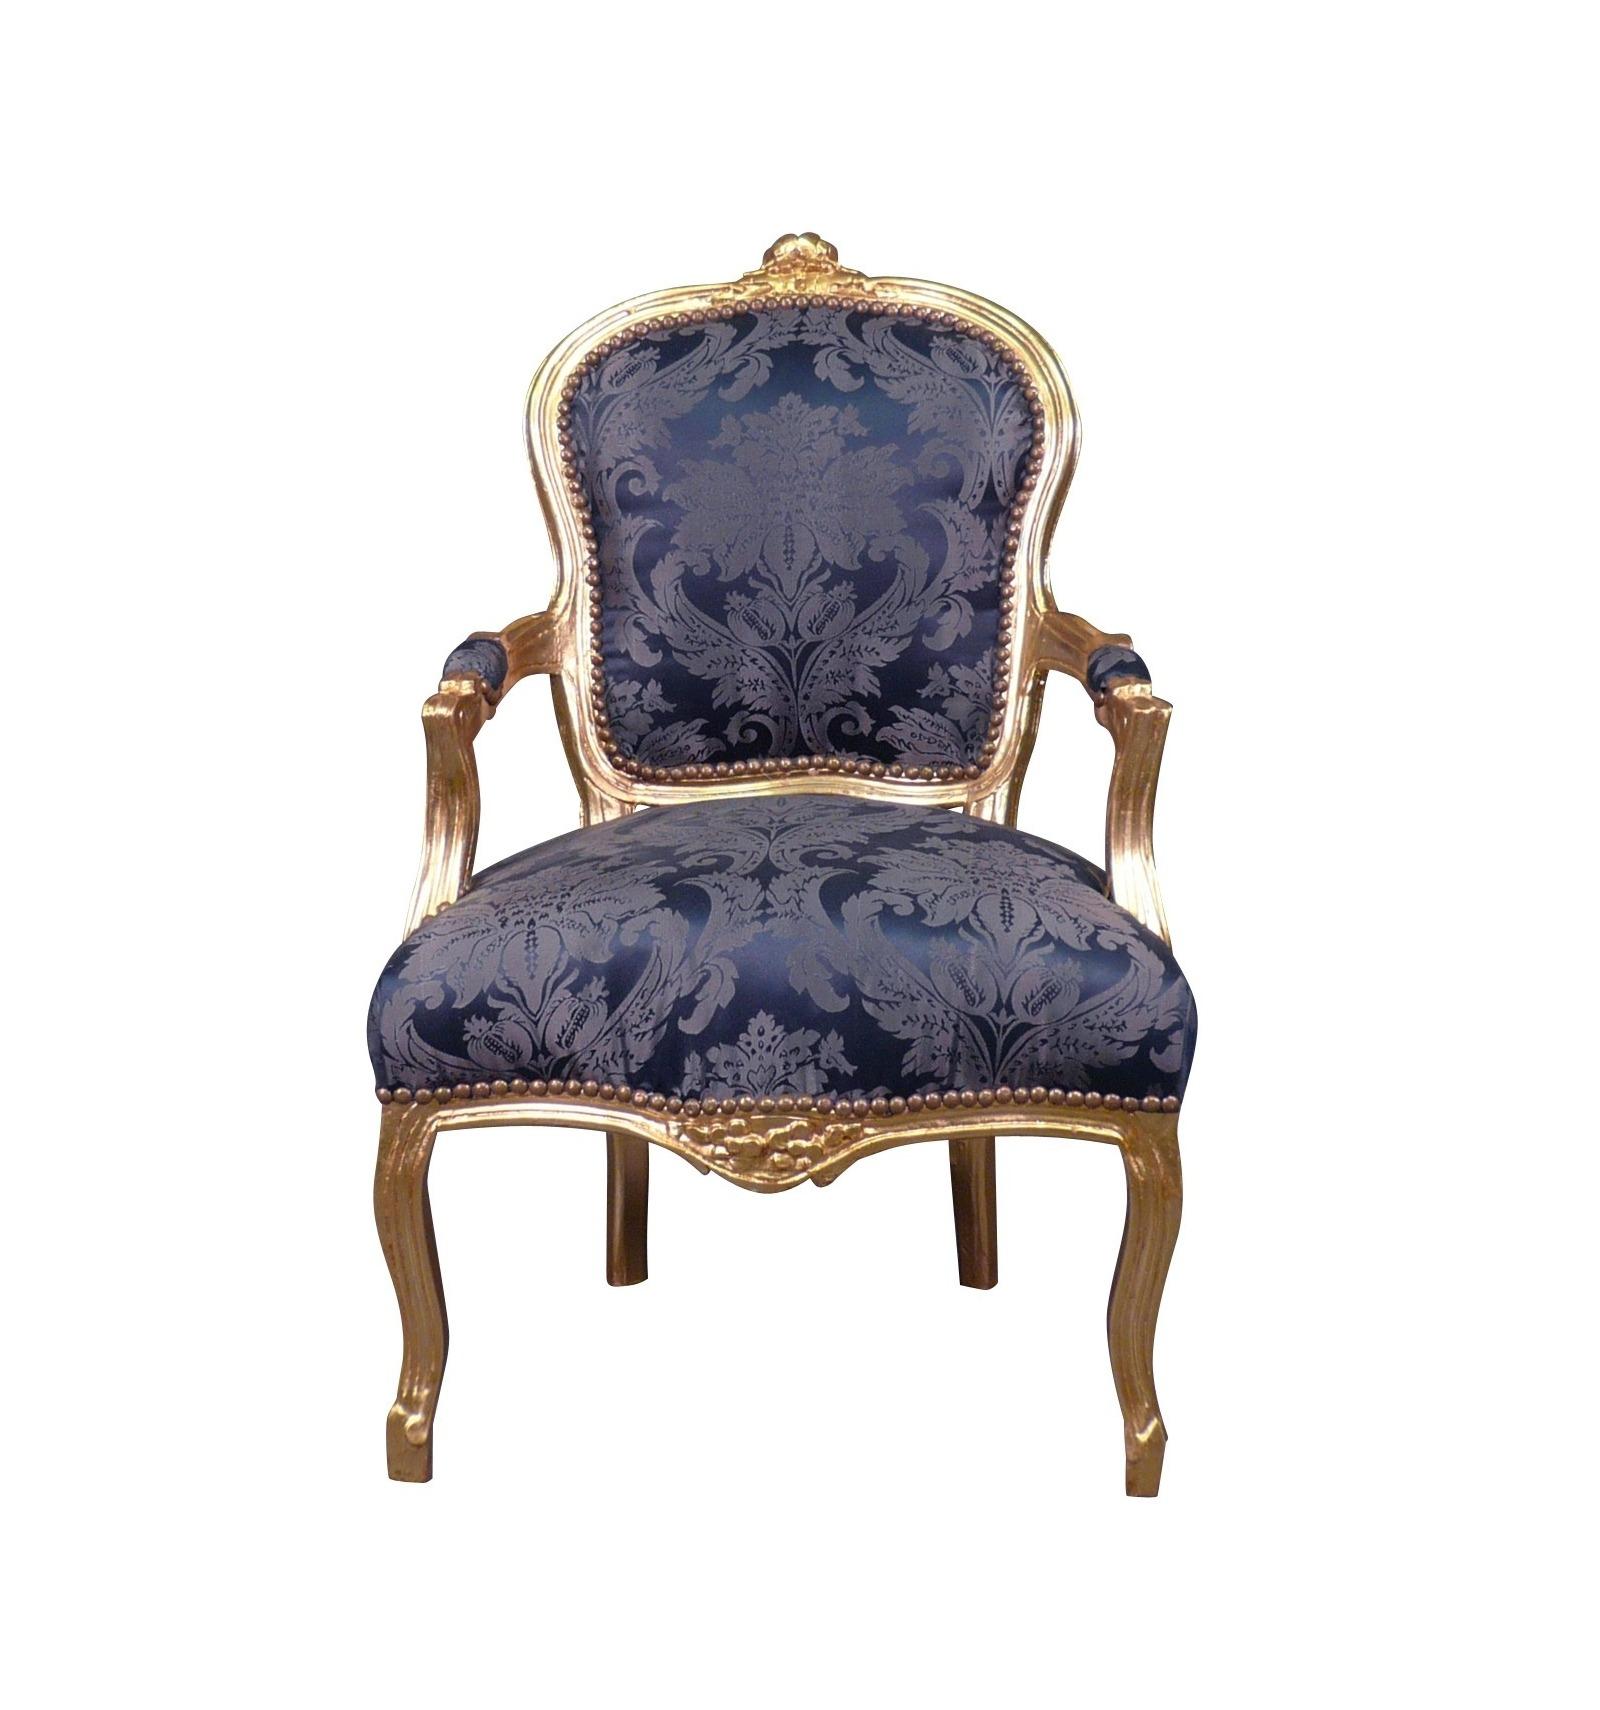 Chaise Salle A Manger Louis Xv fauteuil louis xv bleu roi